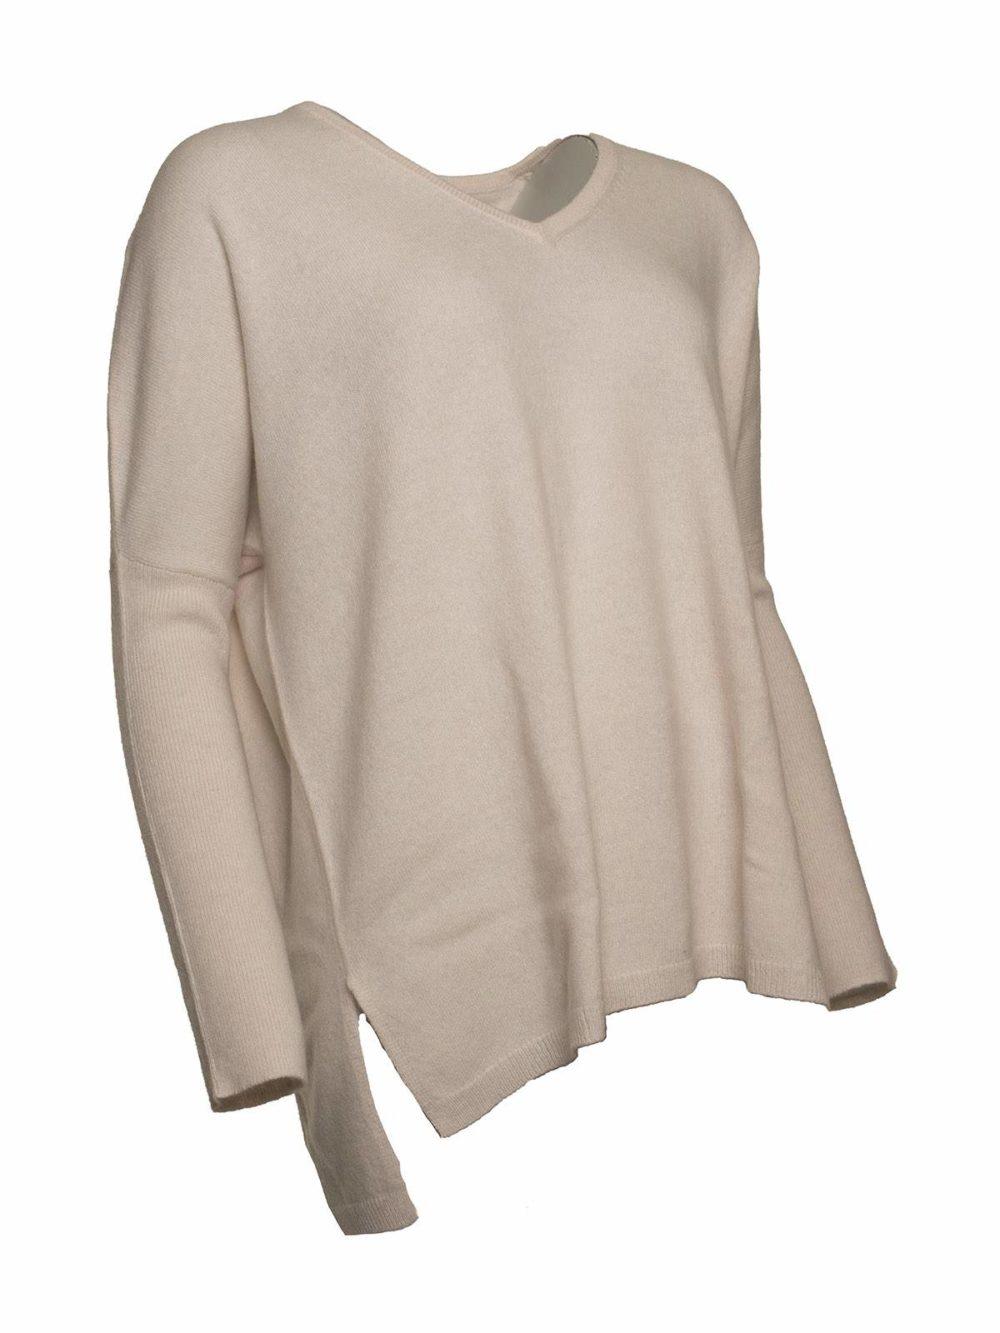 Miss Darcey Jumper Brodie fine cashmere Women's clothing Women's knitwear